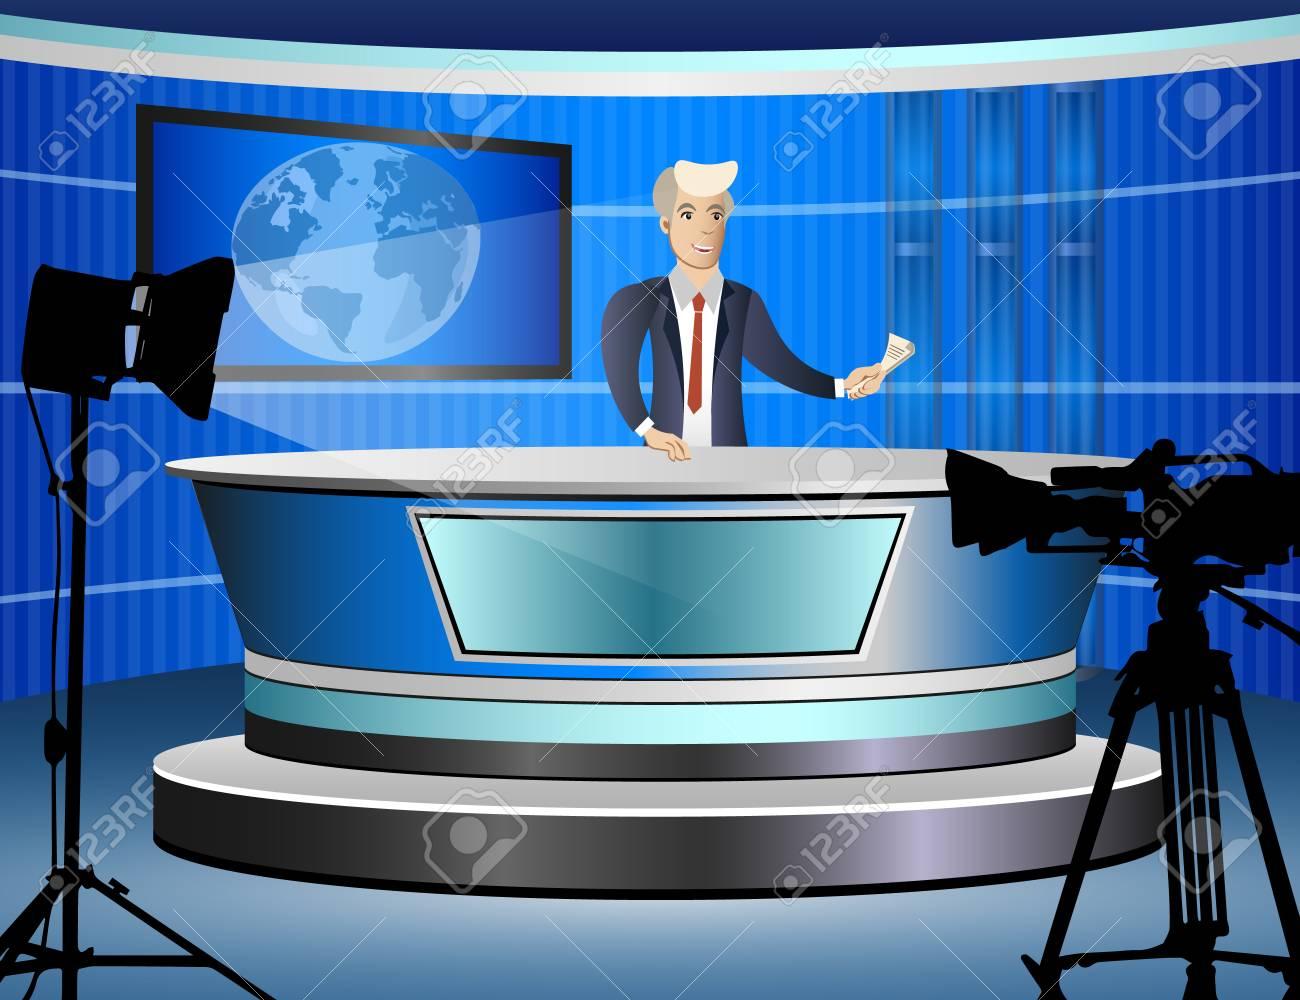 Journalist at work from tv studio - 81180308